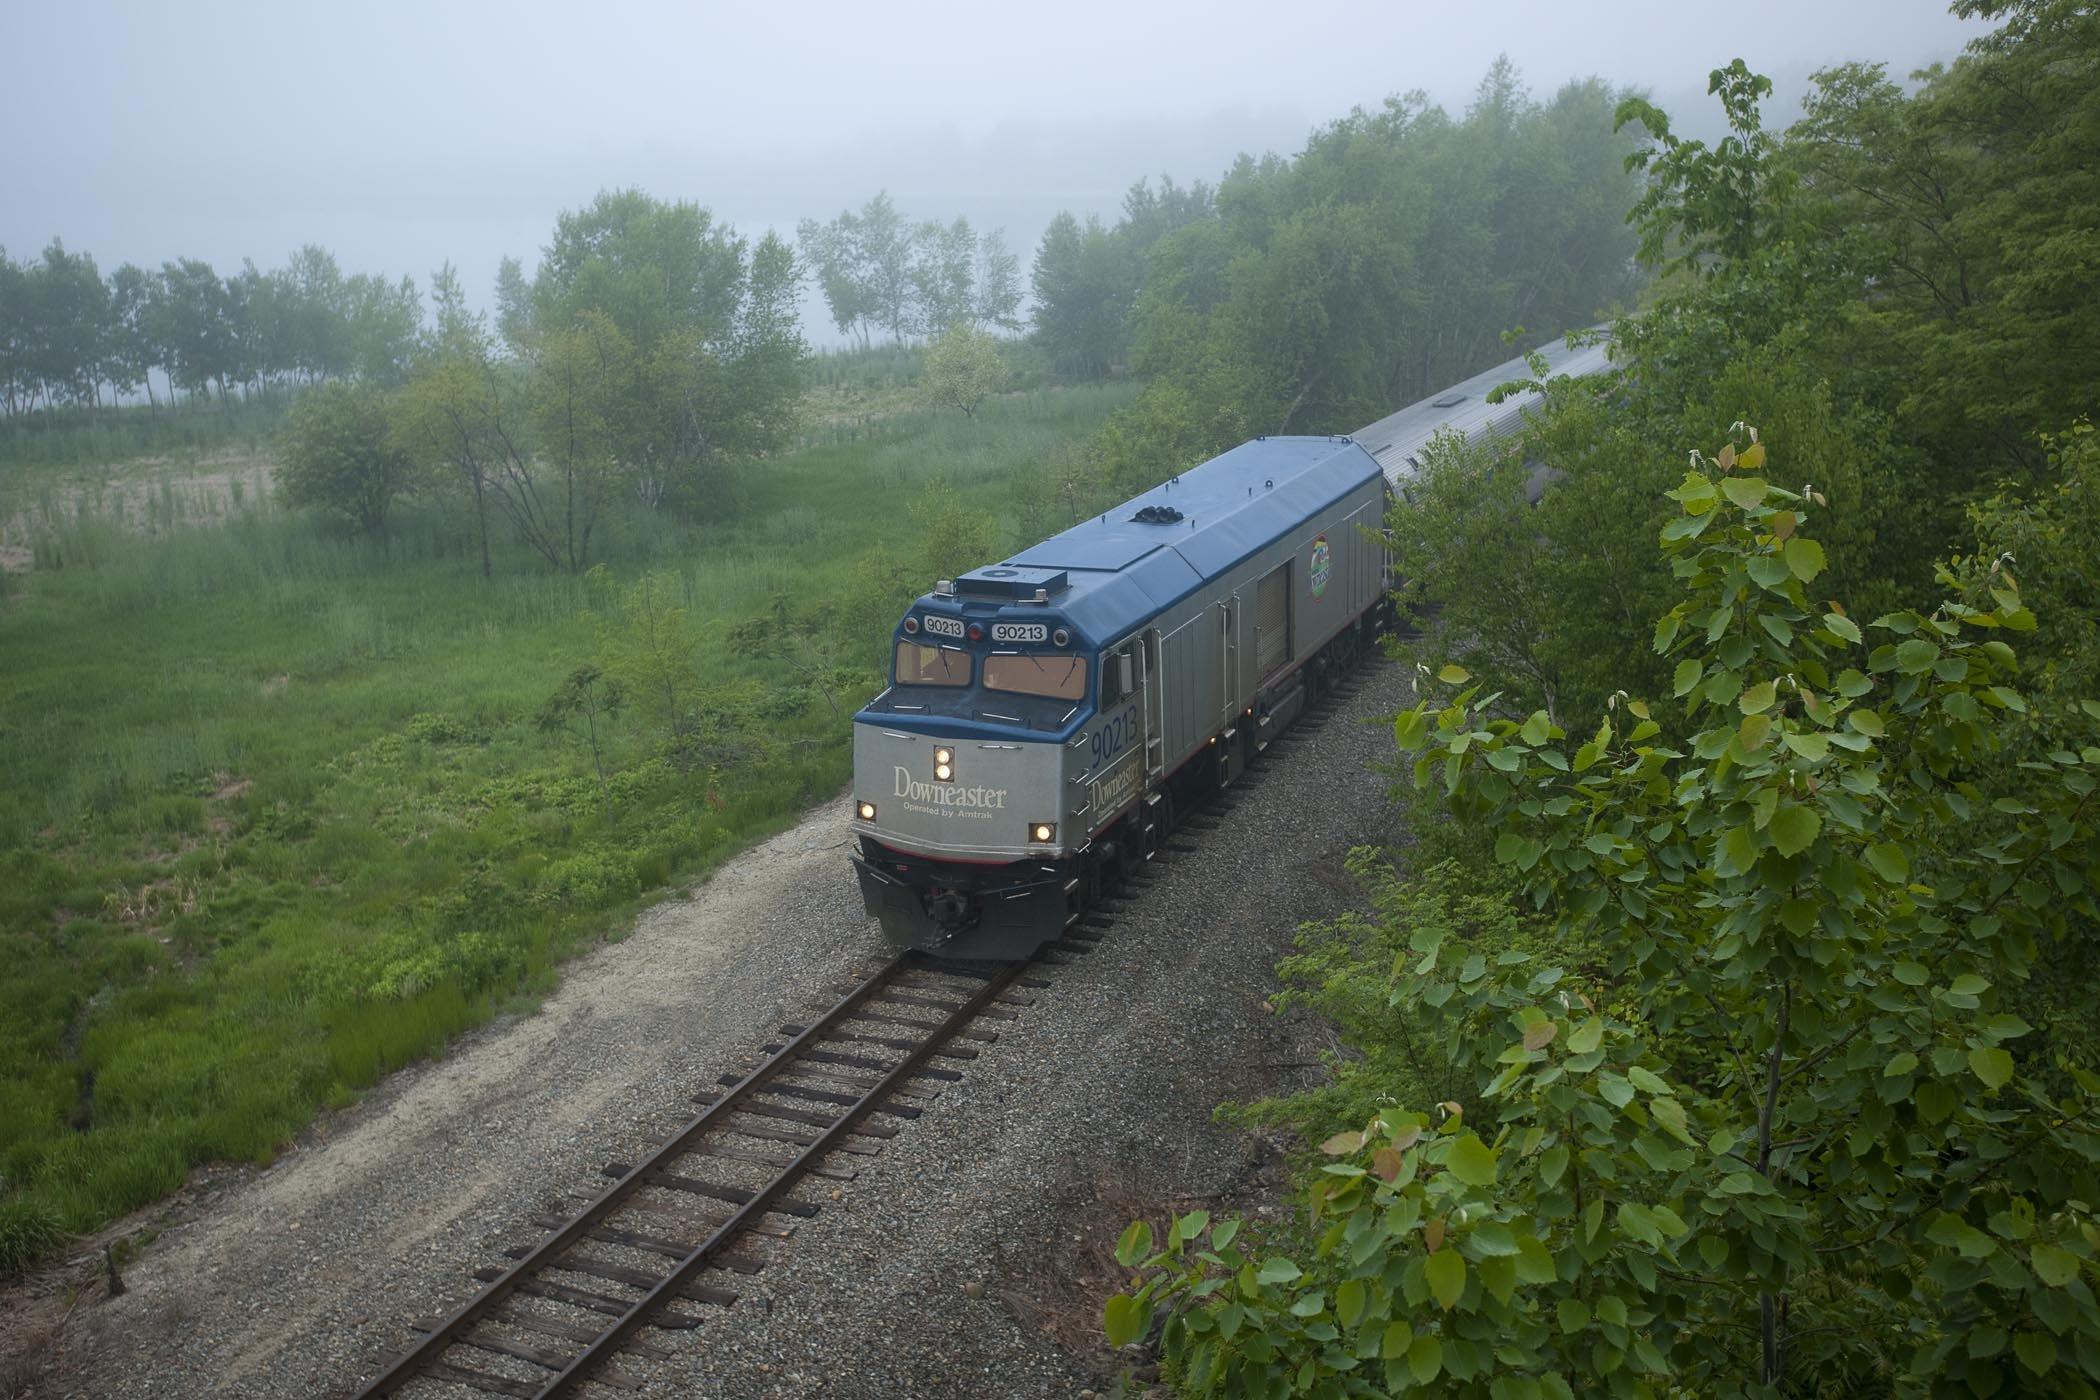 Amtrak Downeaster, Portland Maine